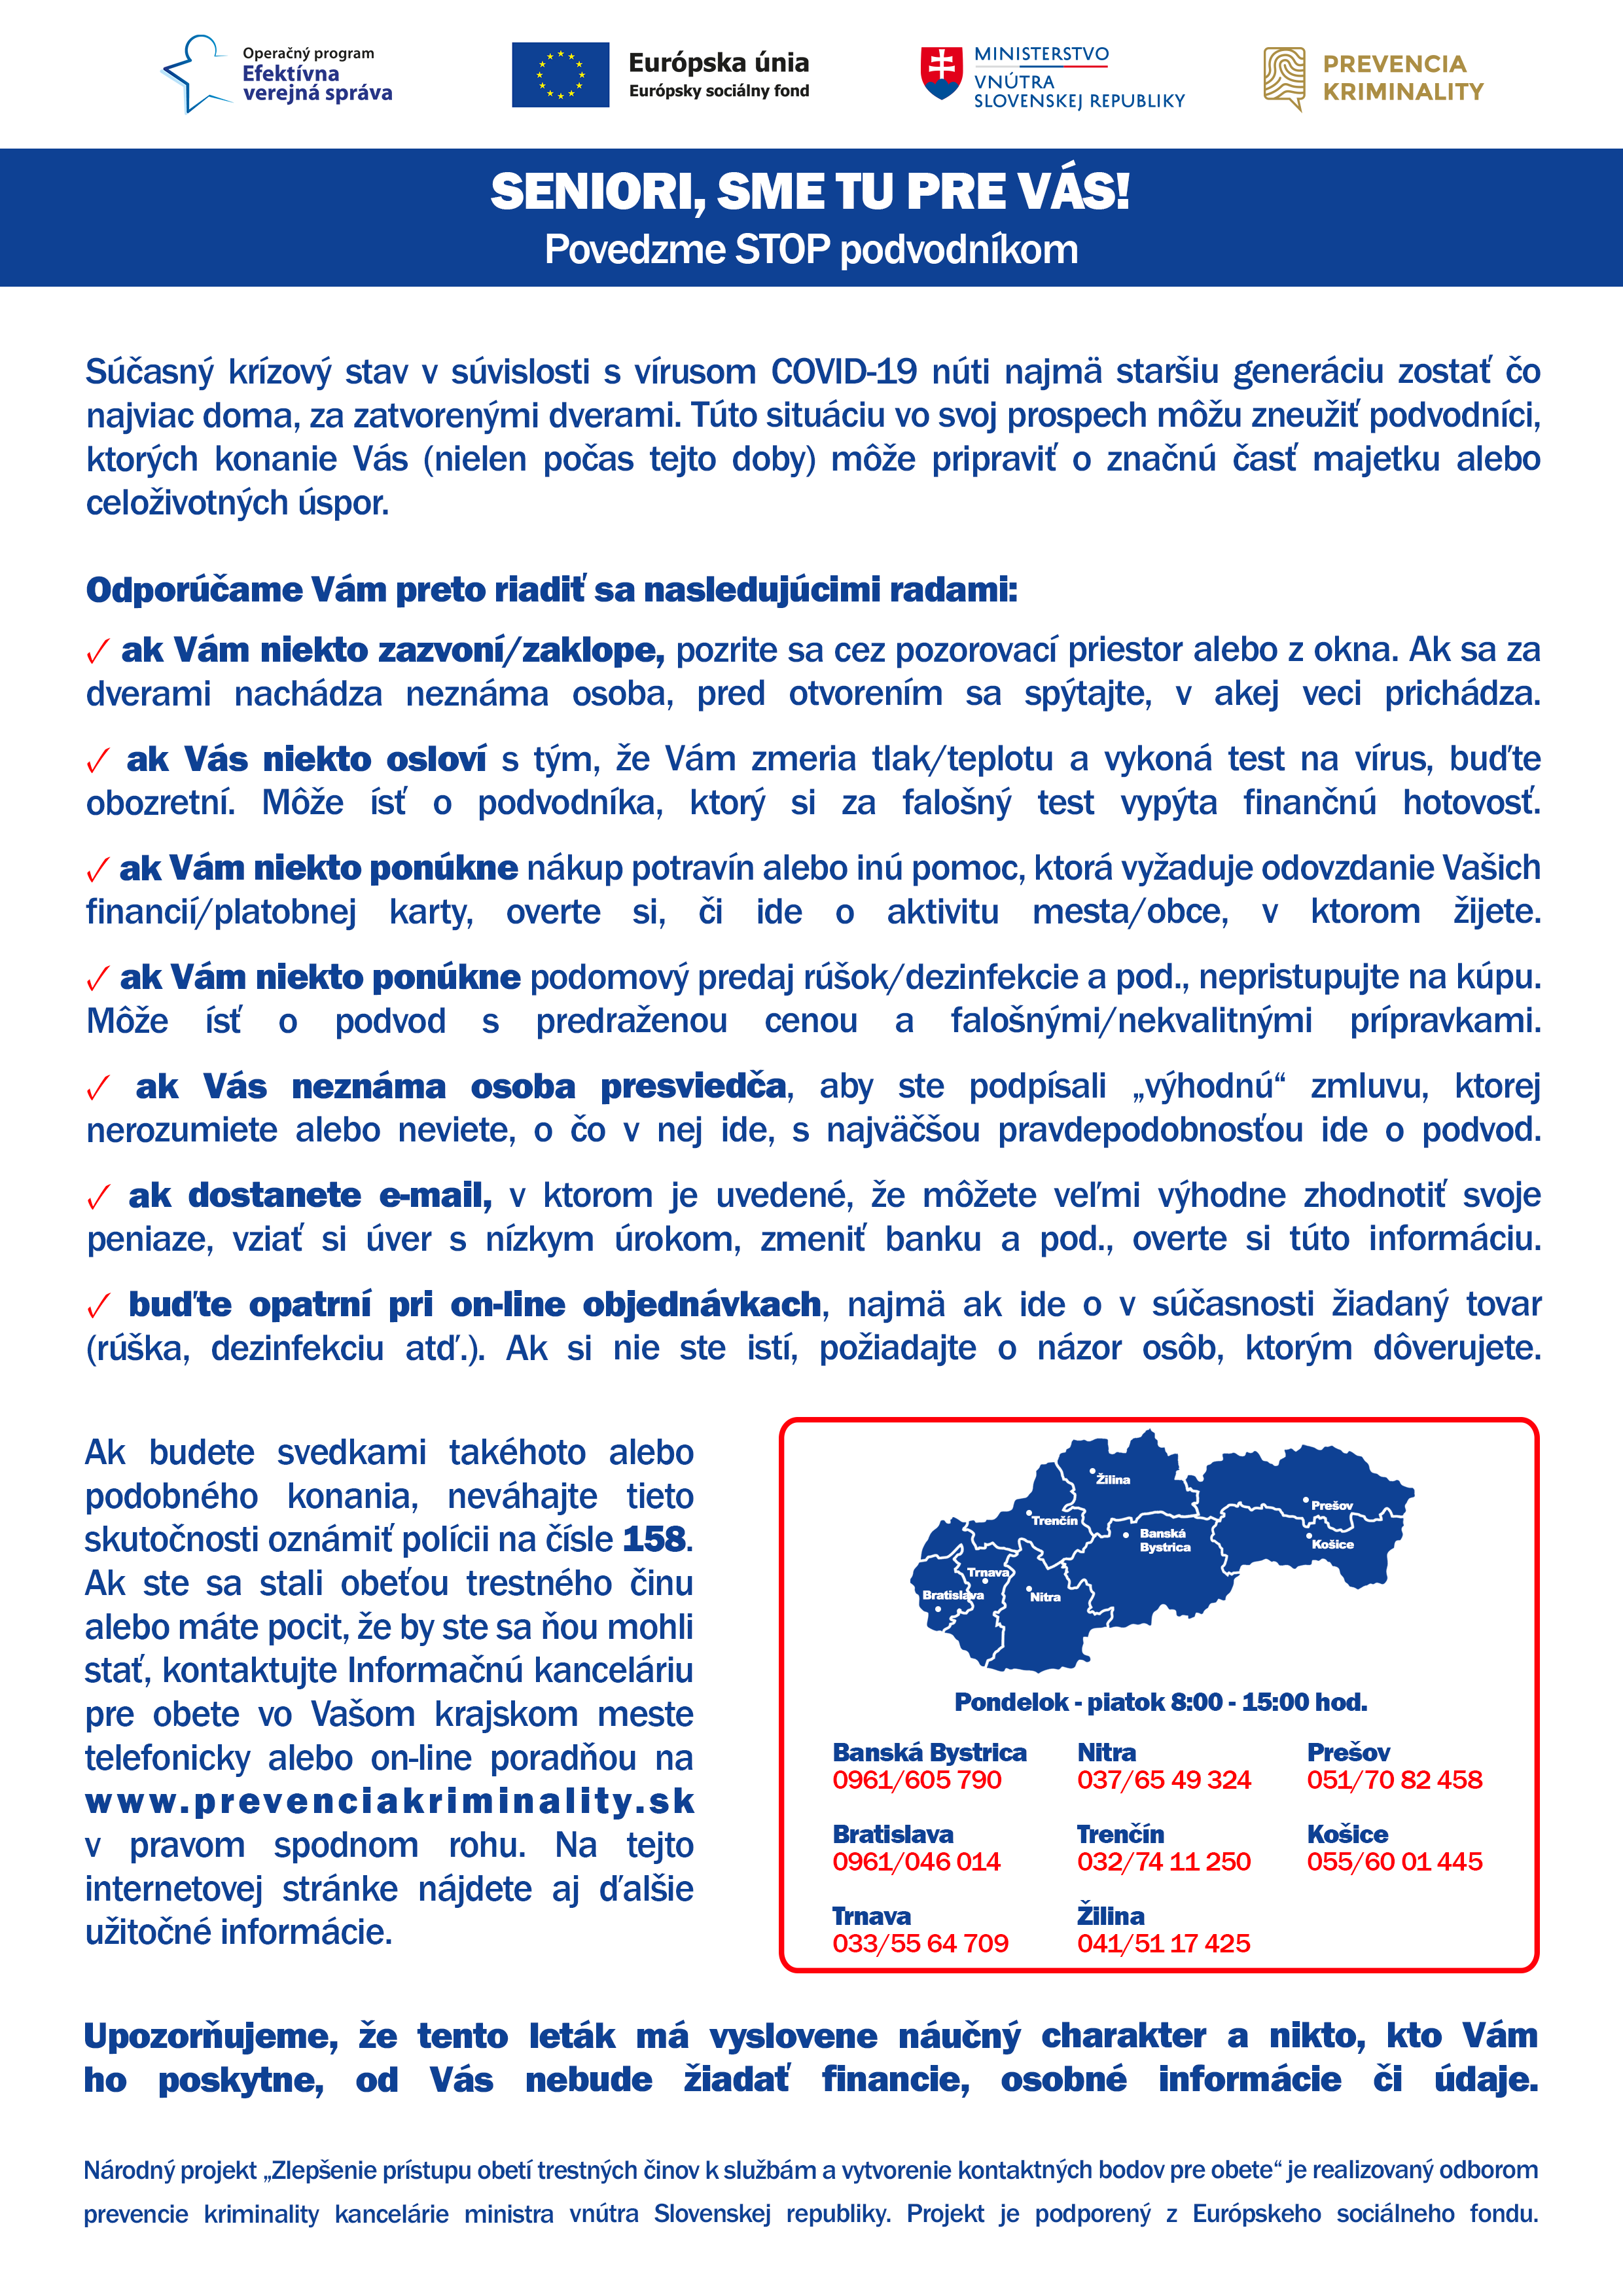 Odbor_prevencie_kriminality_-_Seniori